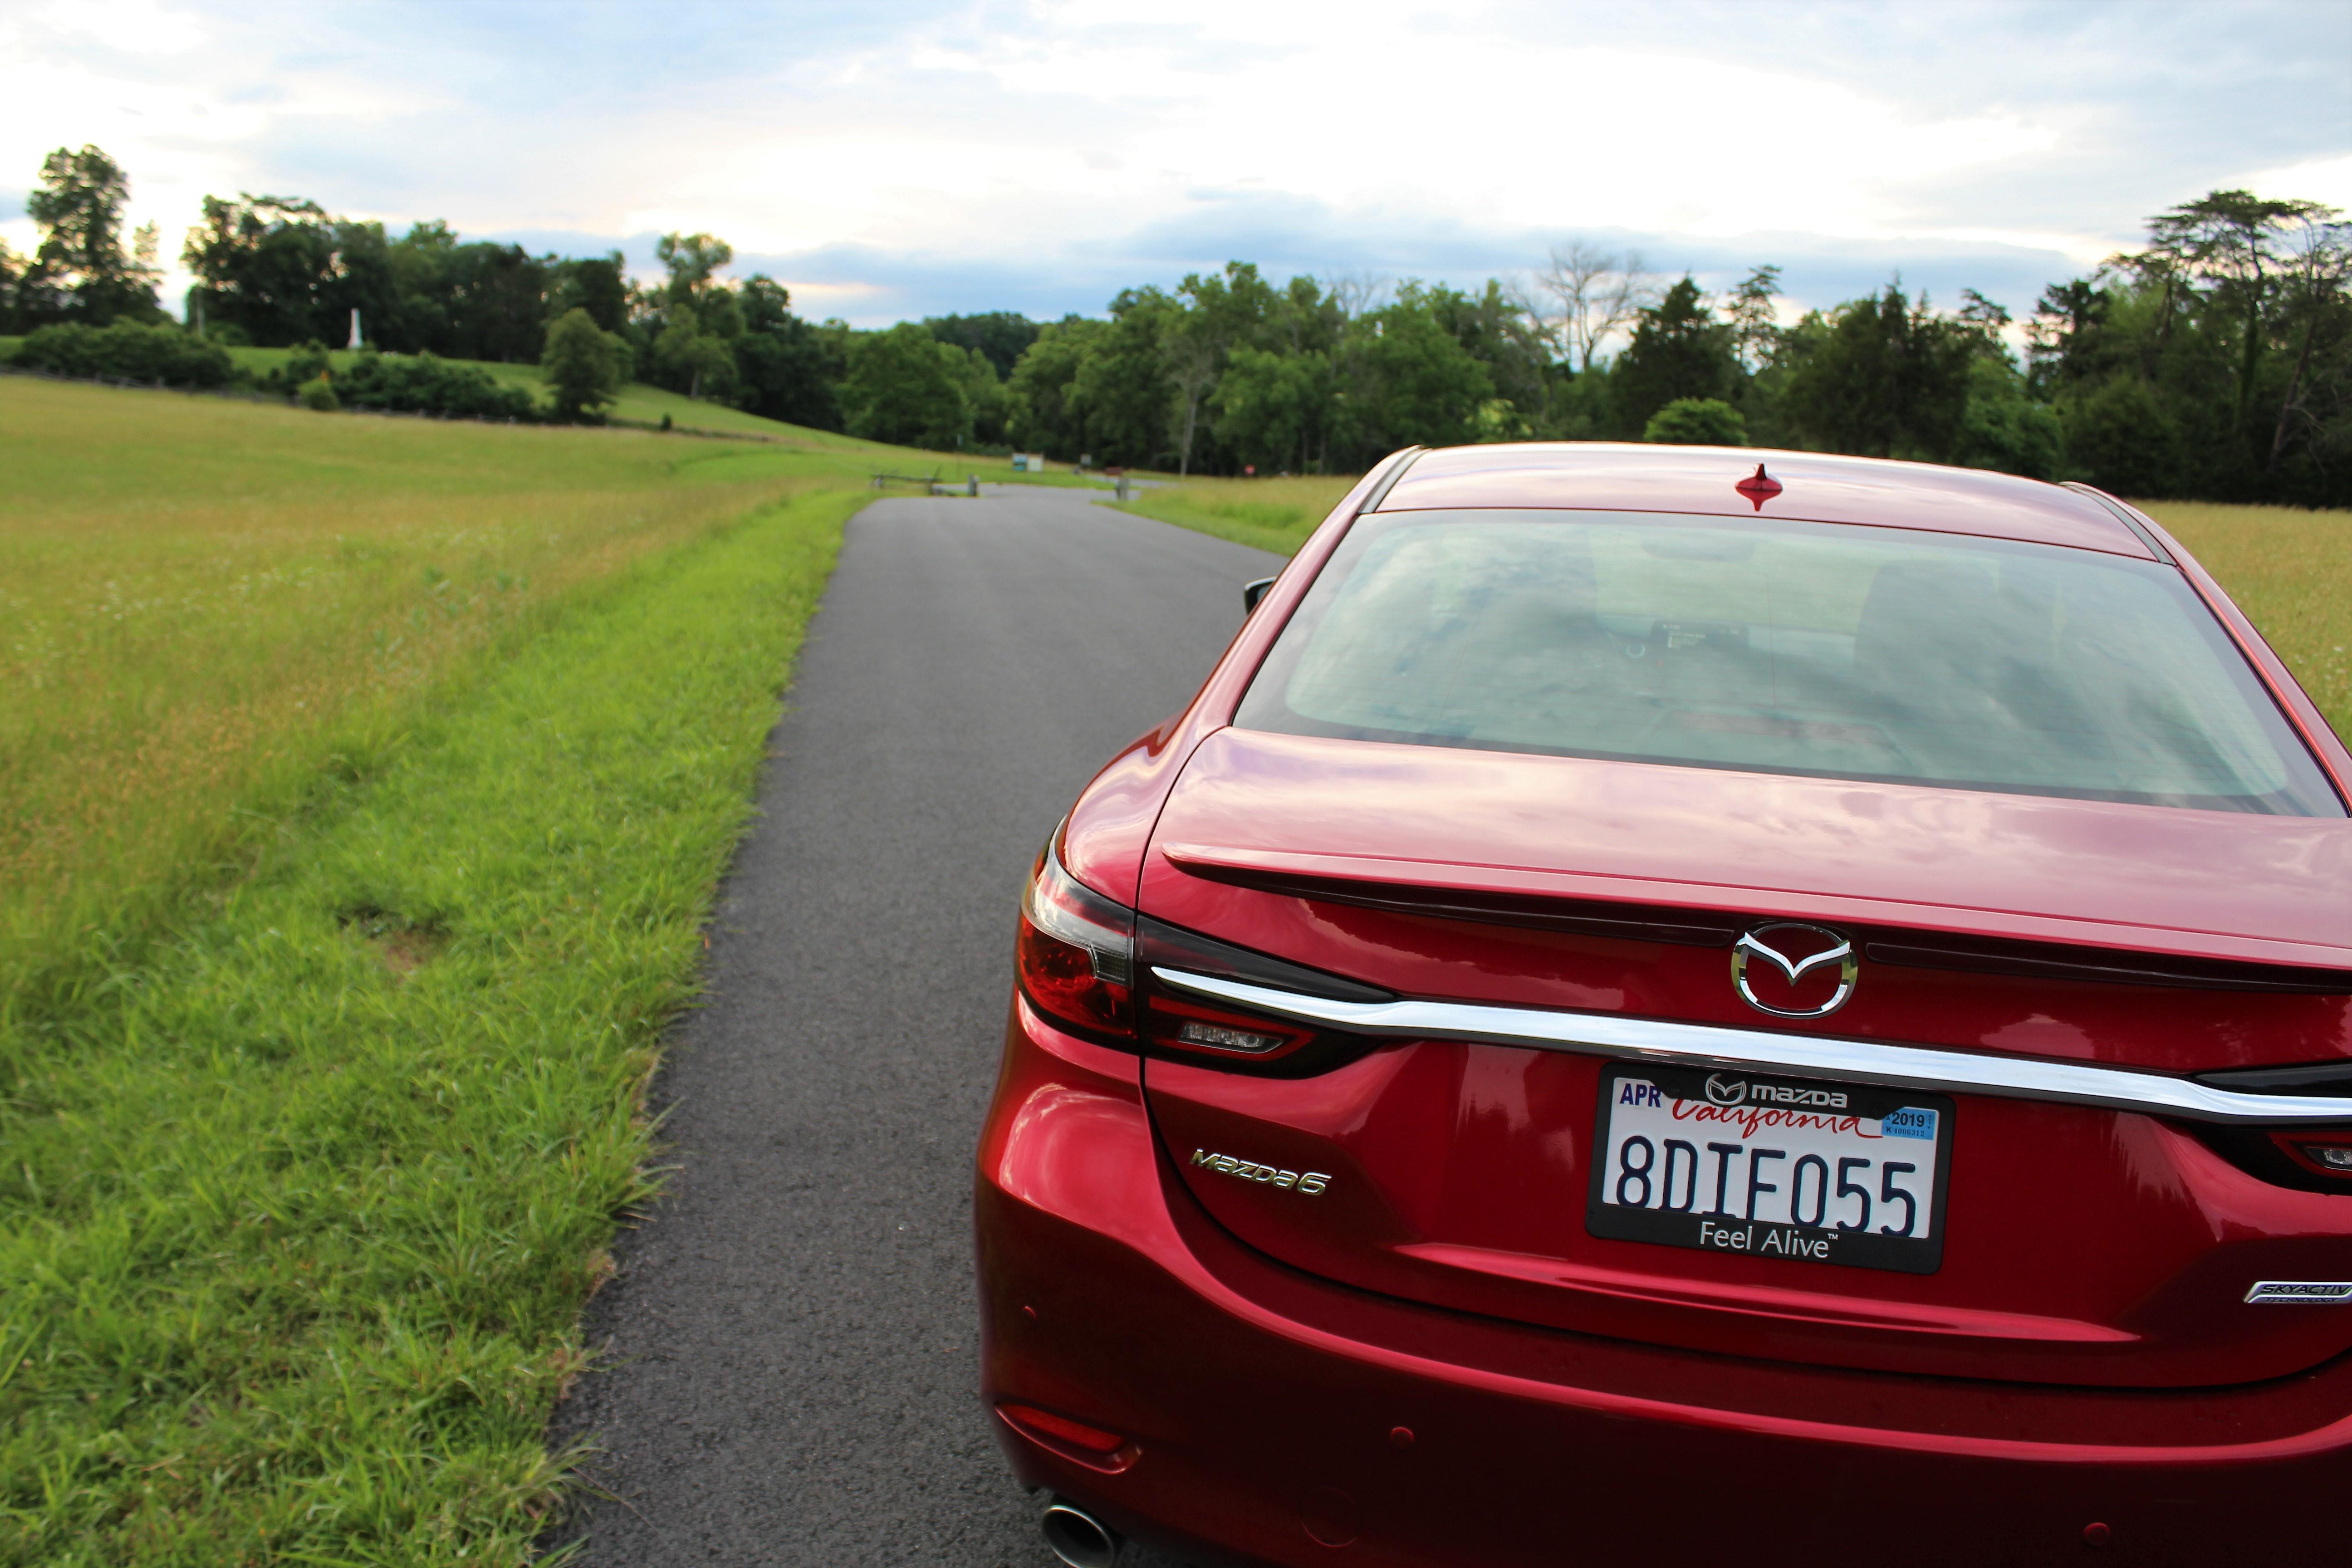 Mazda-6-Rear-Creative-Colonial-Roads